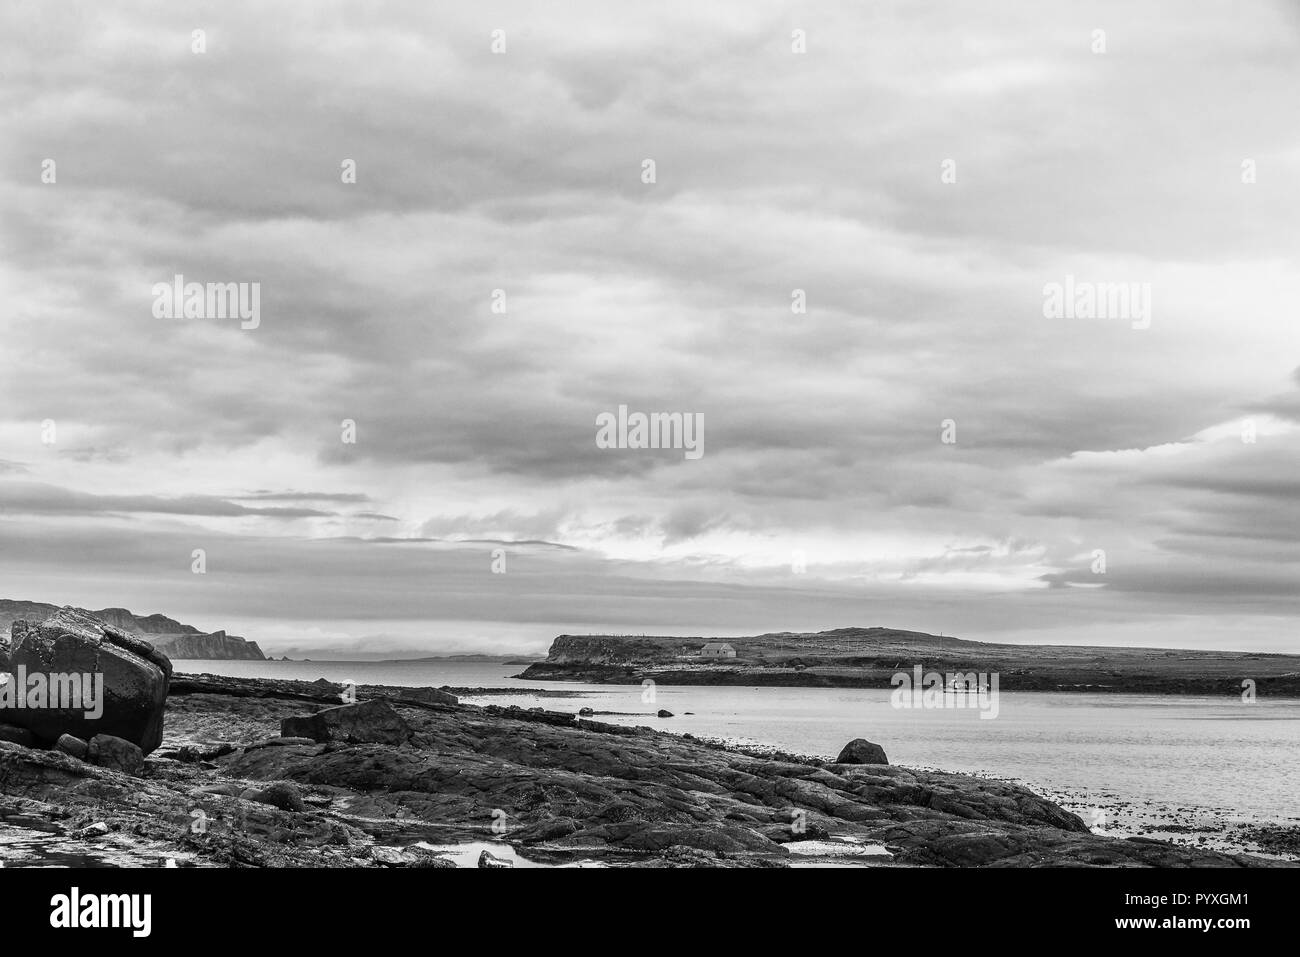 a cloudy morning sunrise over Staffin coastal road, isle of skye - Stock Image